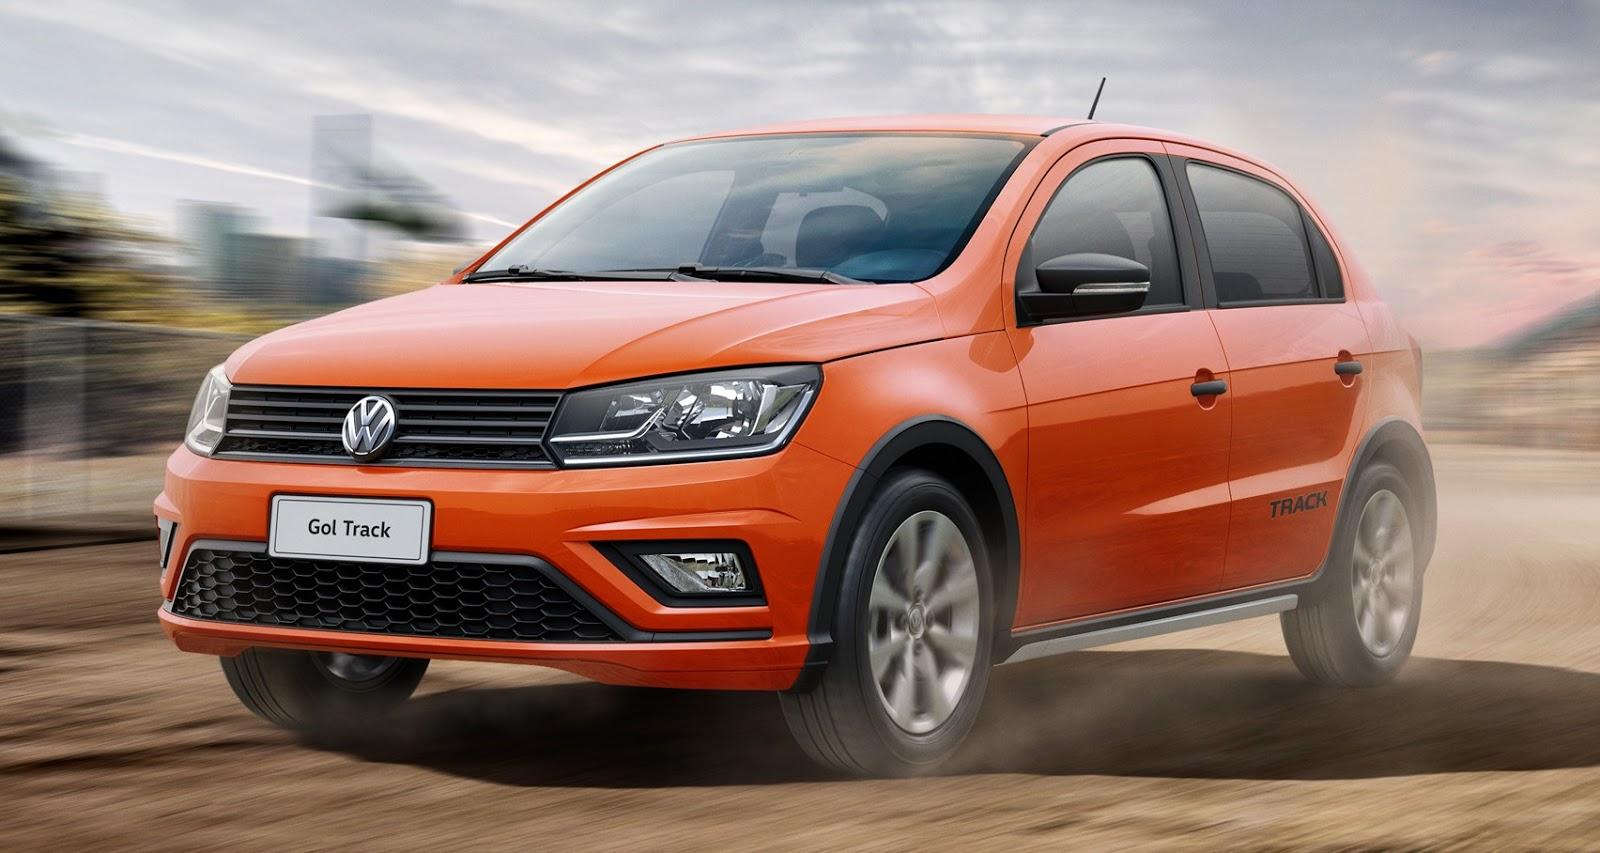 Volkswagen Gol Track alia visual aventureiro e lista completa de equipamentos